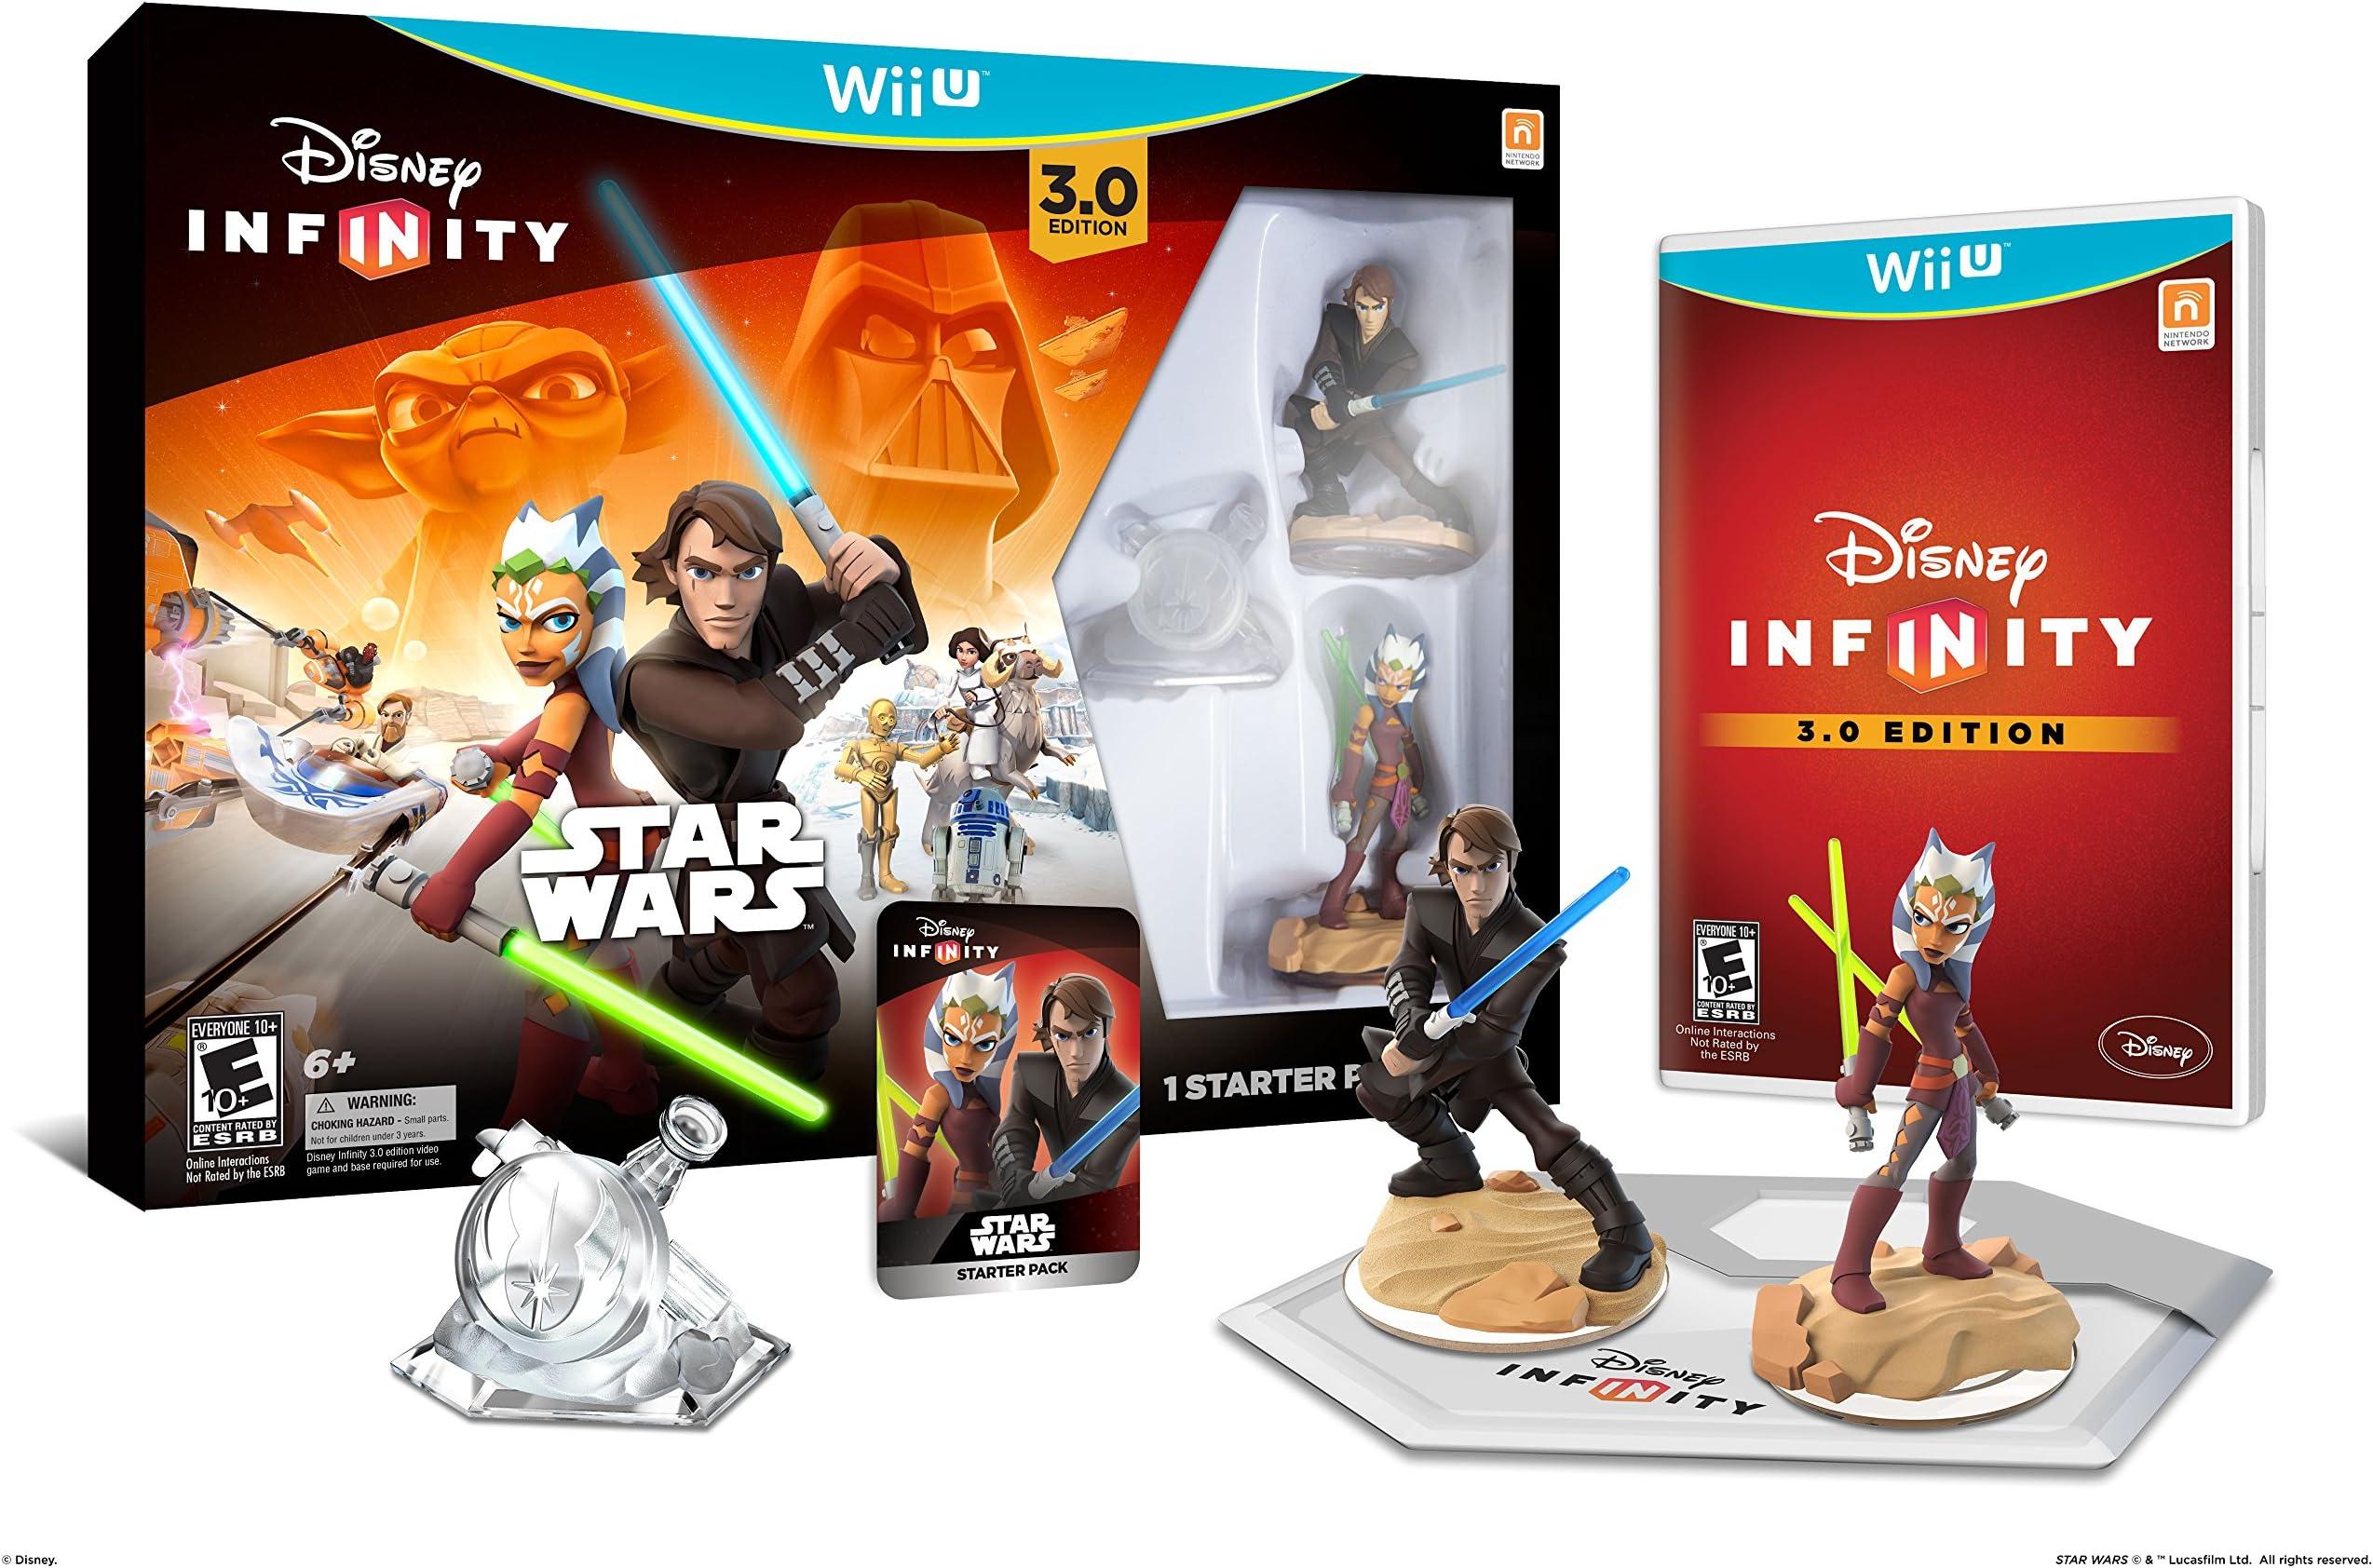 12e4e49fc622b Amazon.com: Disney Infinity 3.0 Edition Starter Pack - Wii U ...